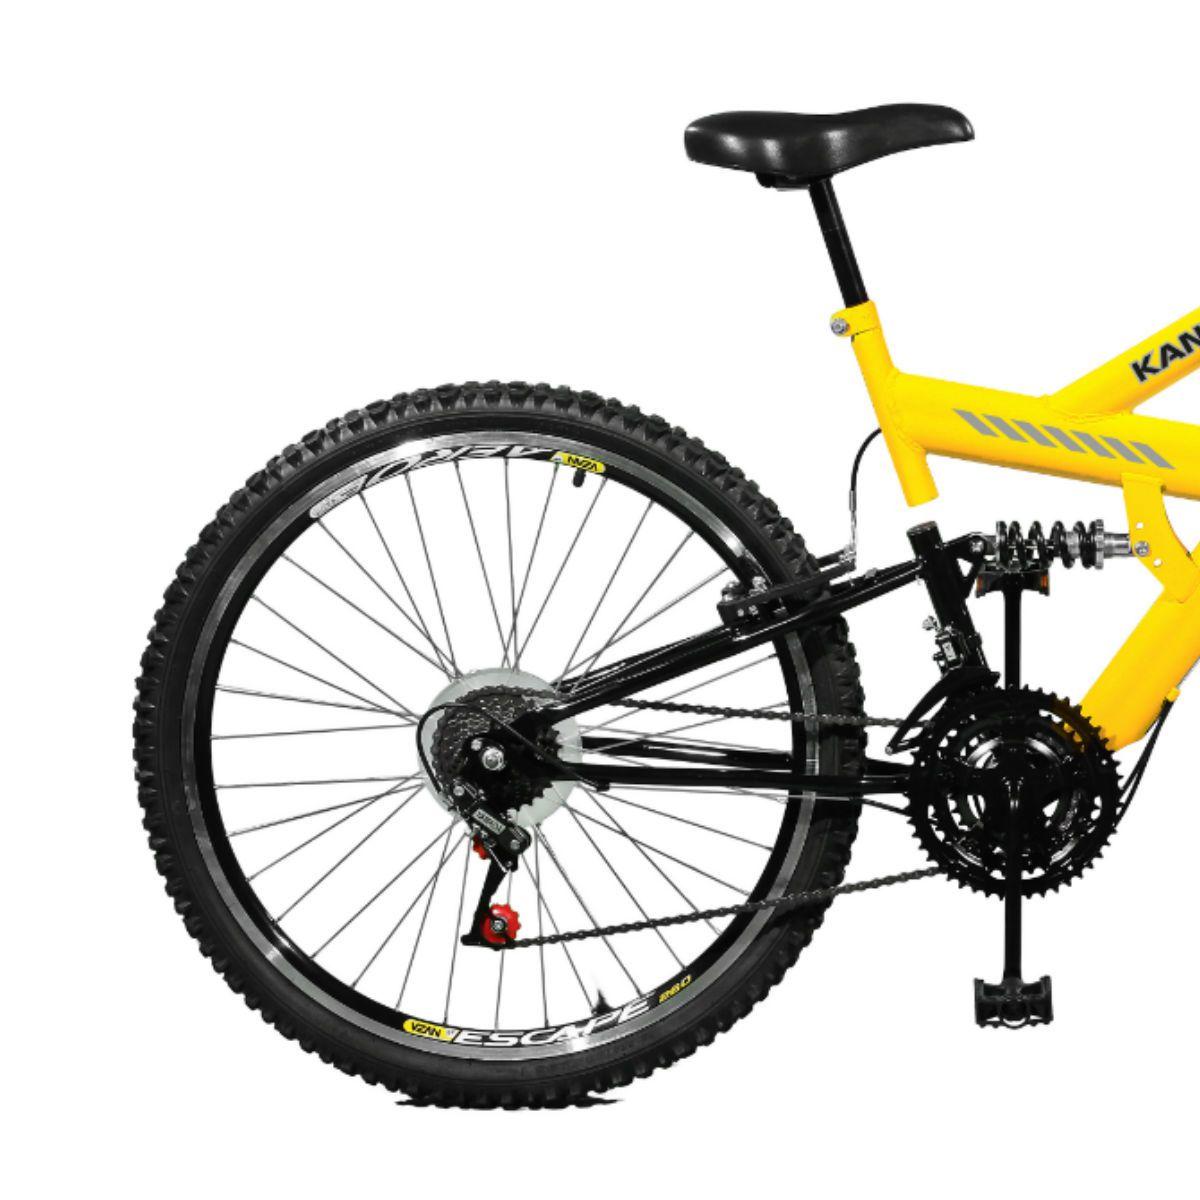 Bicicleta Master Bike Aro 26 Kanguru Style 21 Marchas A-36 V-Brake Amarelo/Preto